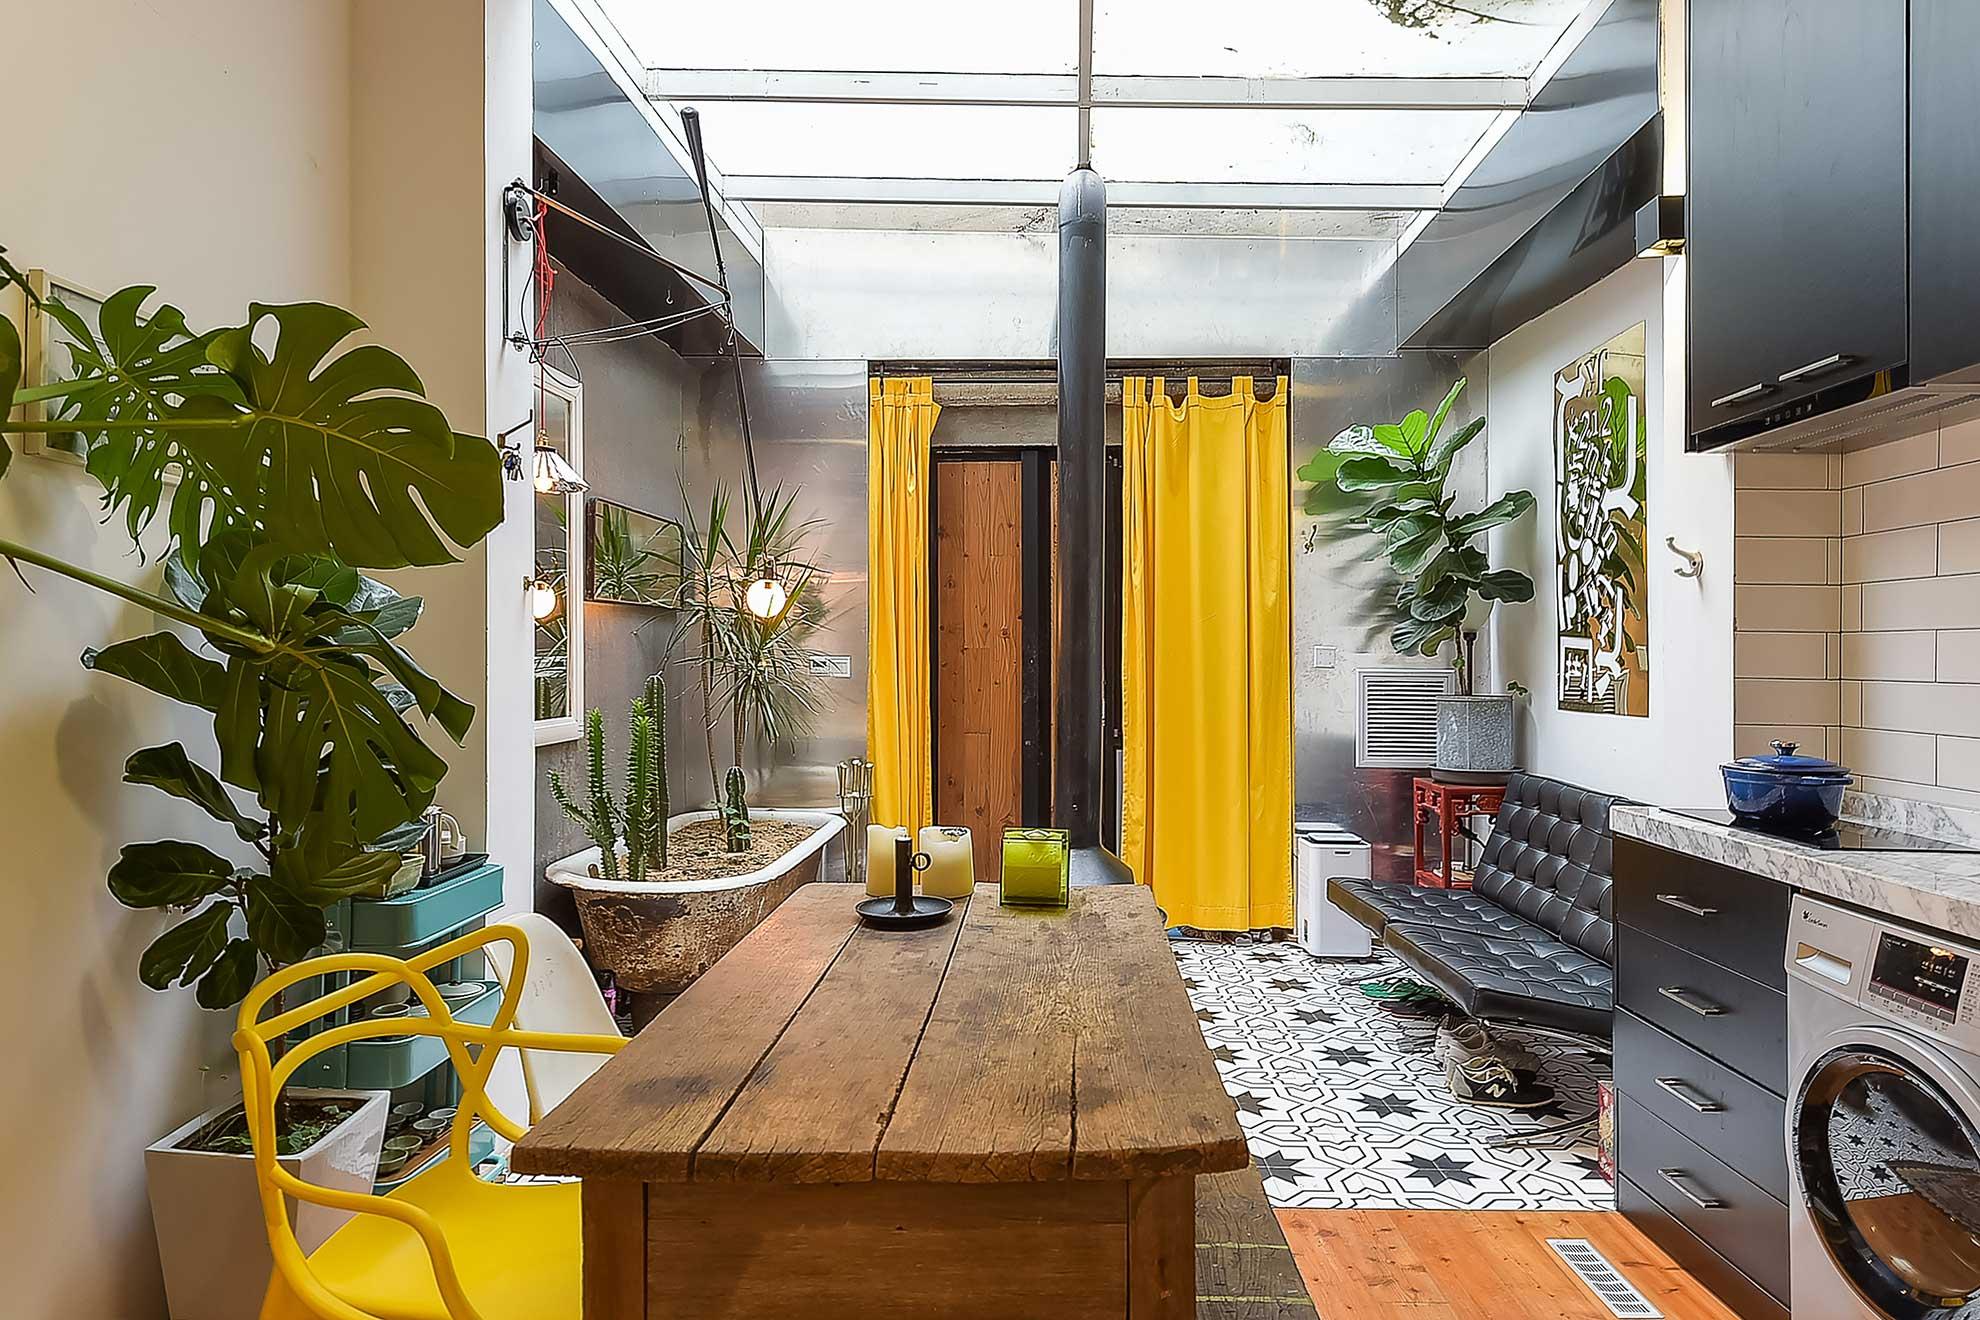 Airbnb listing interior